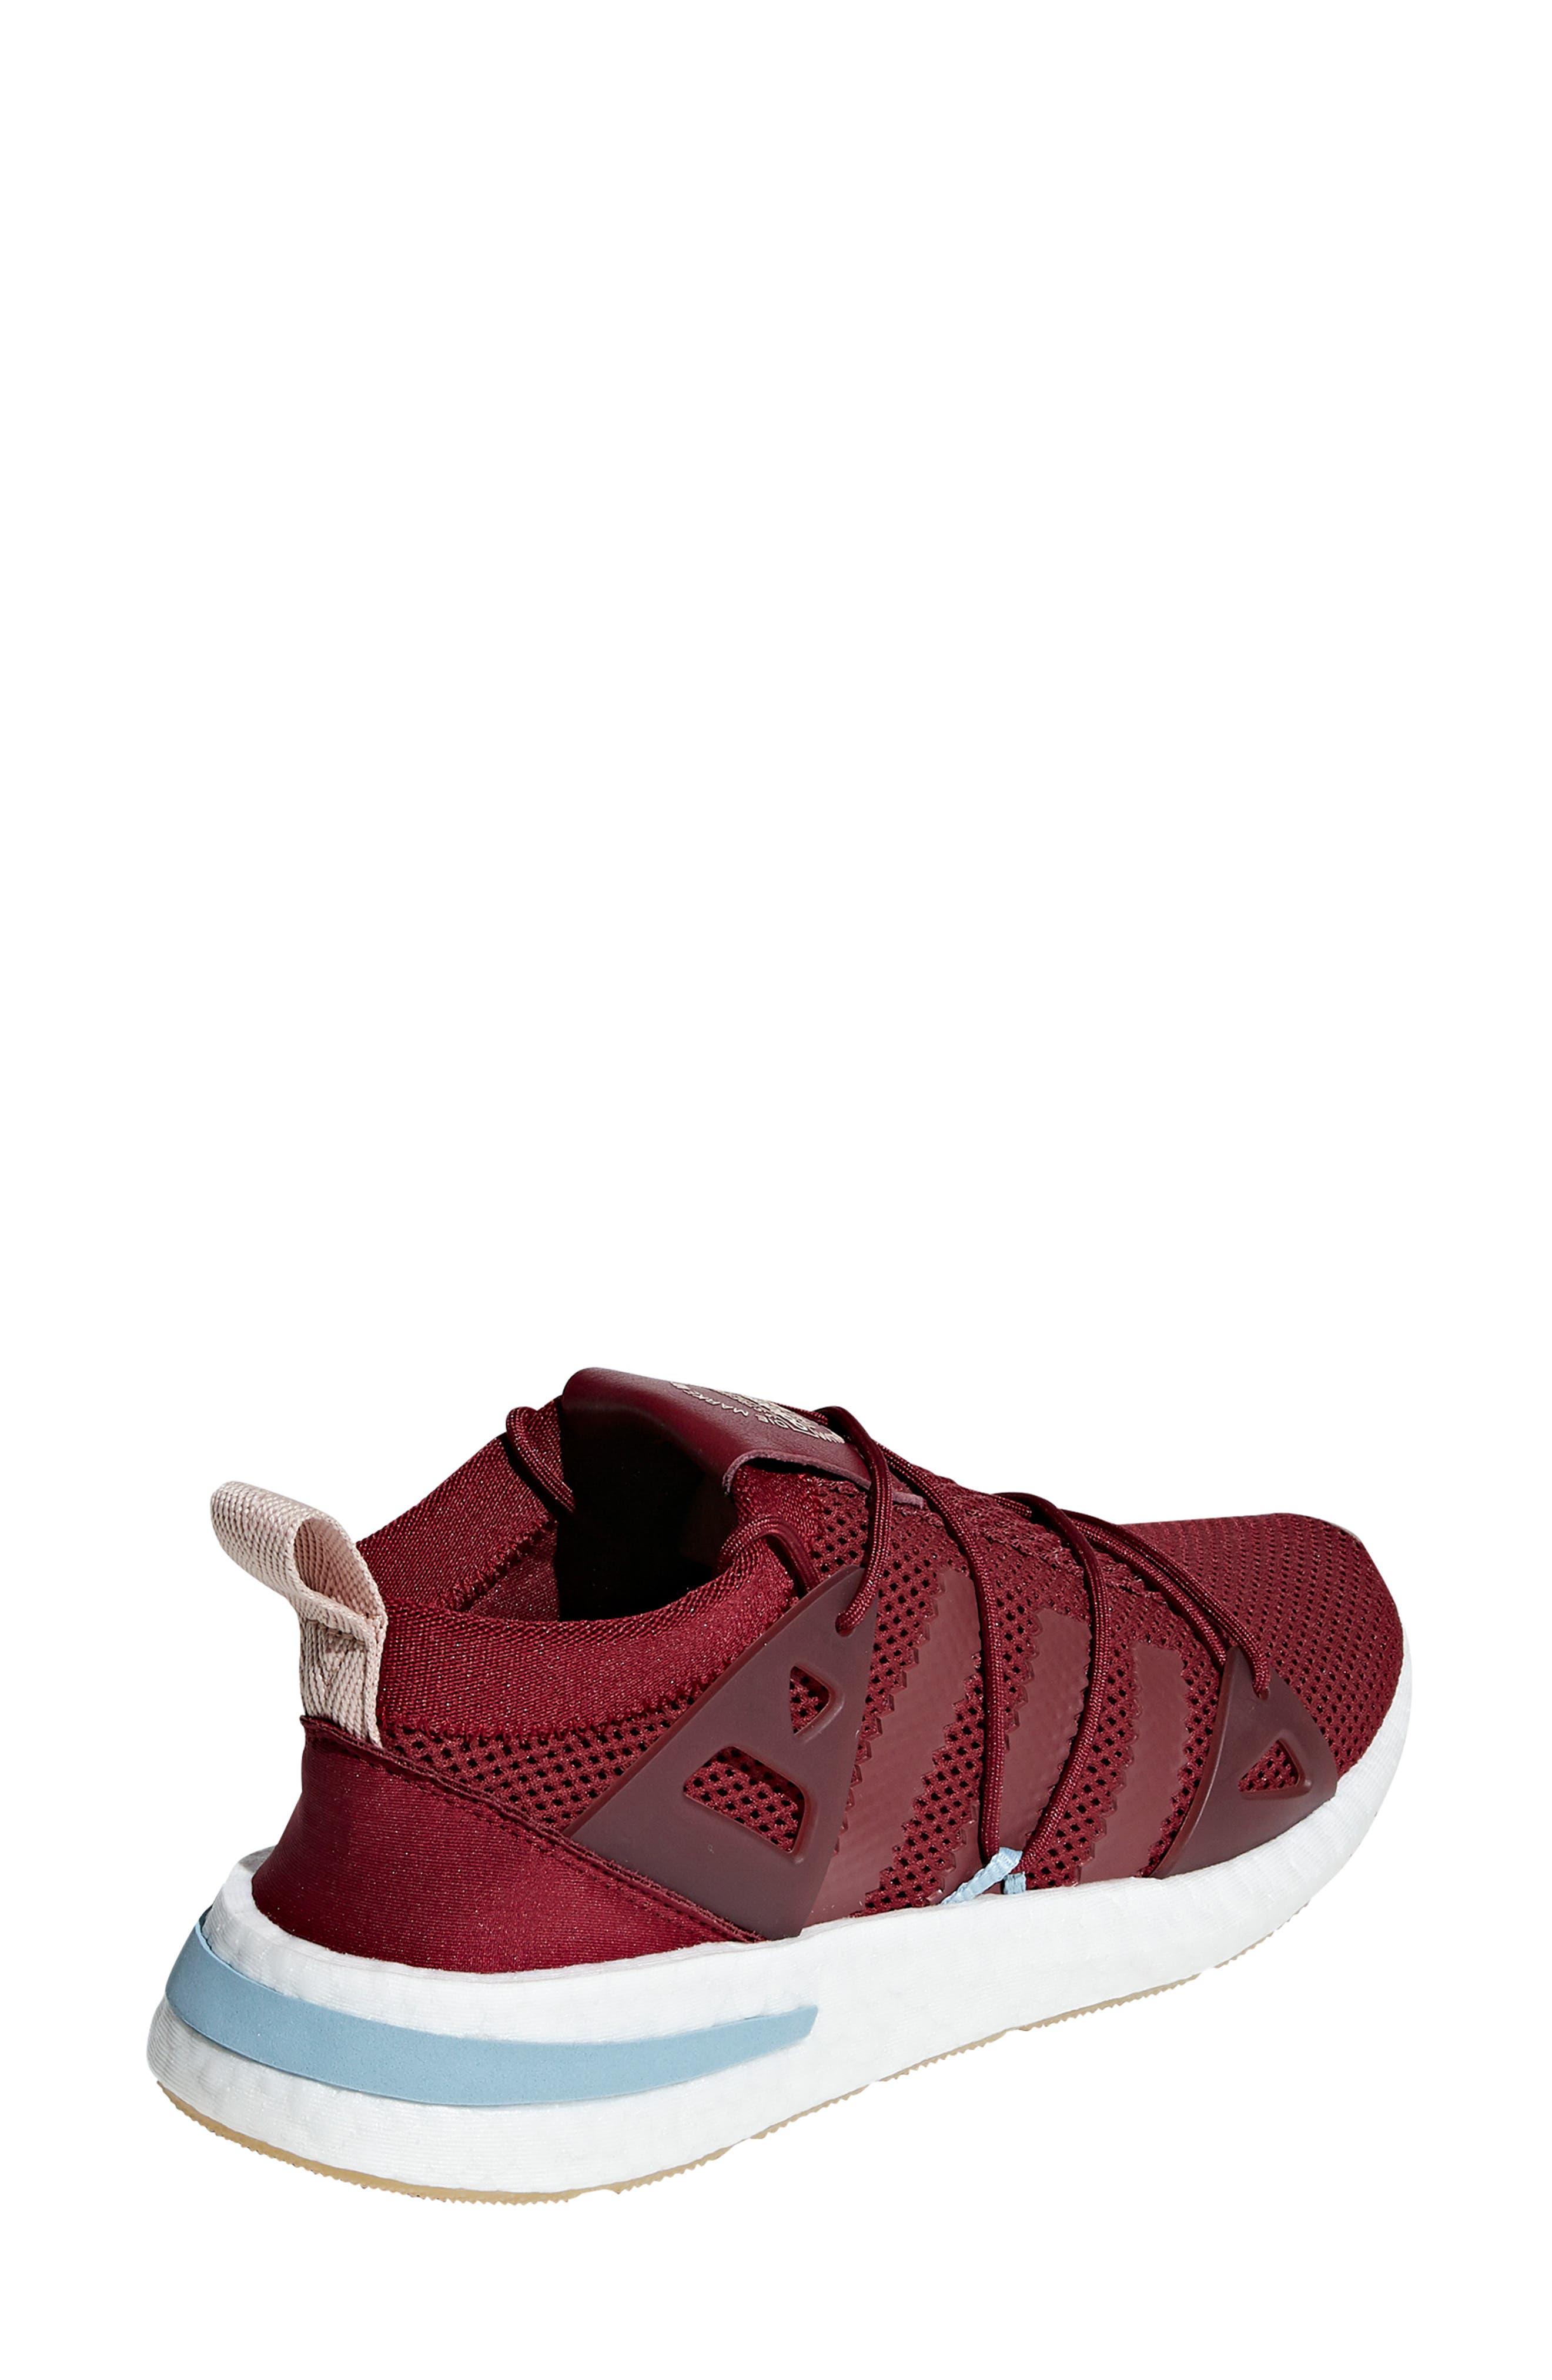 b03088d54b7c Women s Adidas Shoes